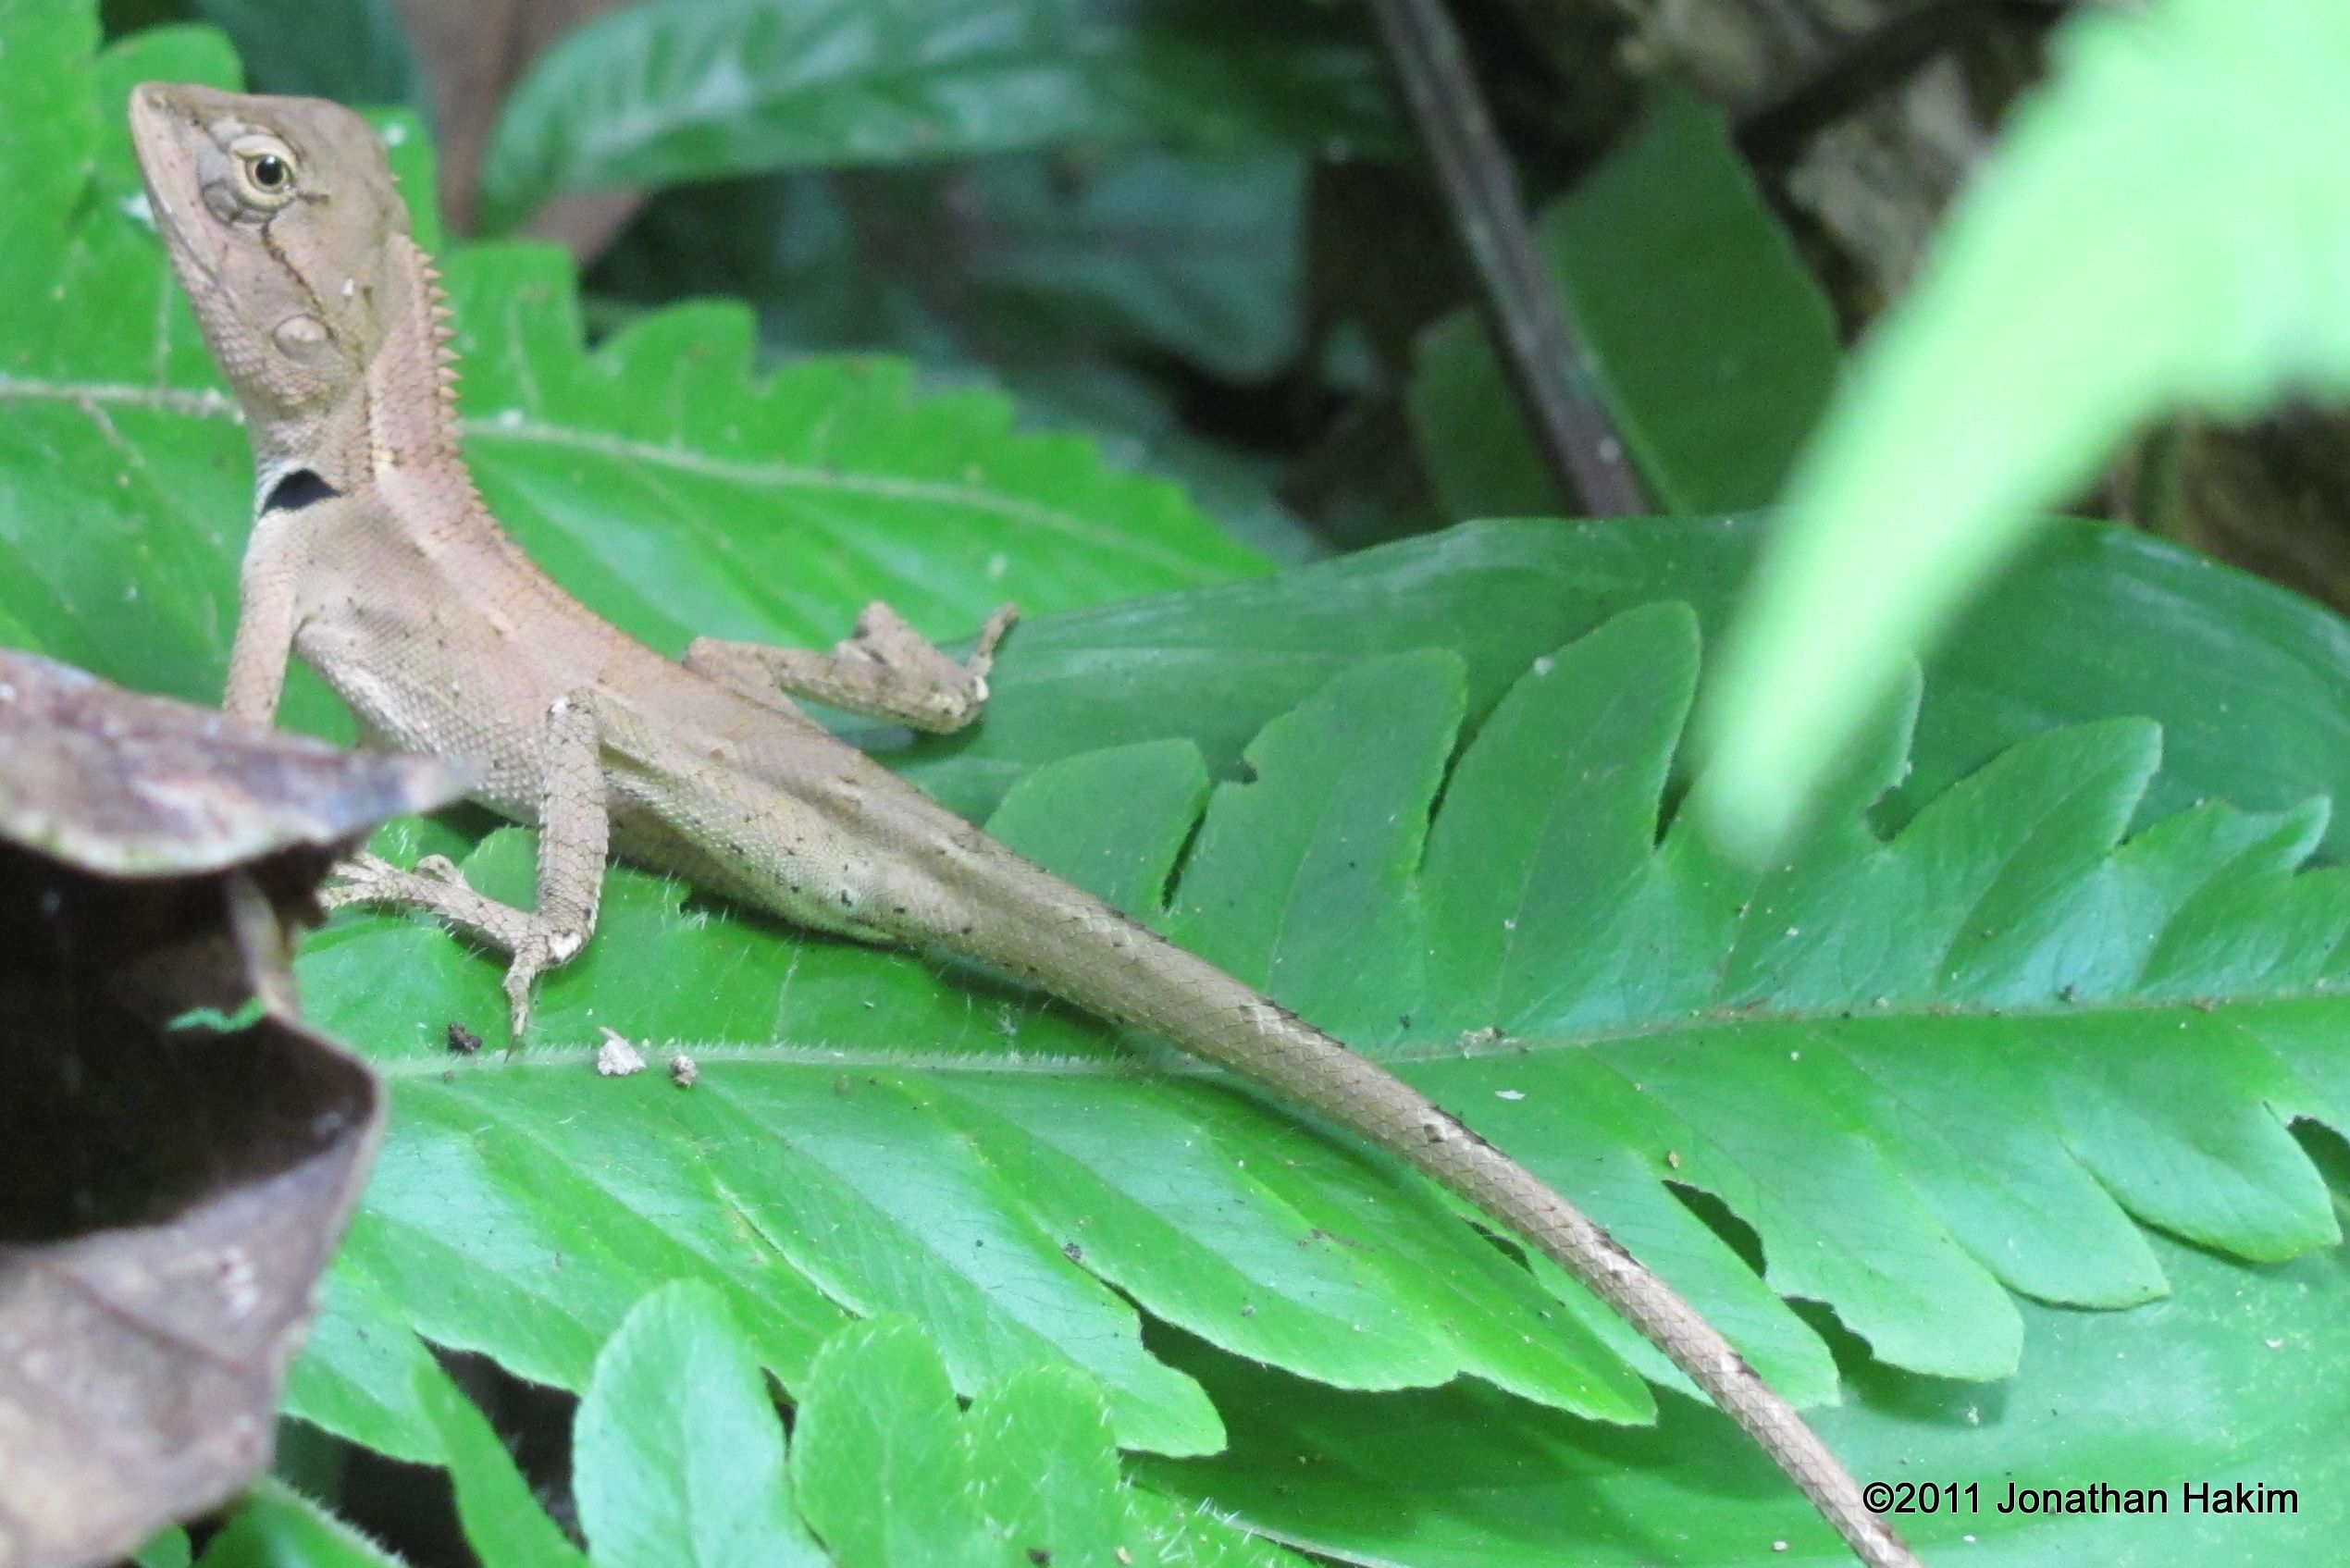 Drawn reptile garden lizard Amphibians Oriental Garden and of